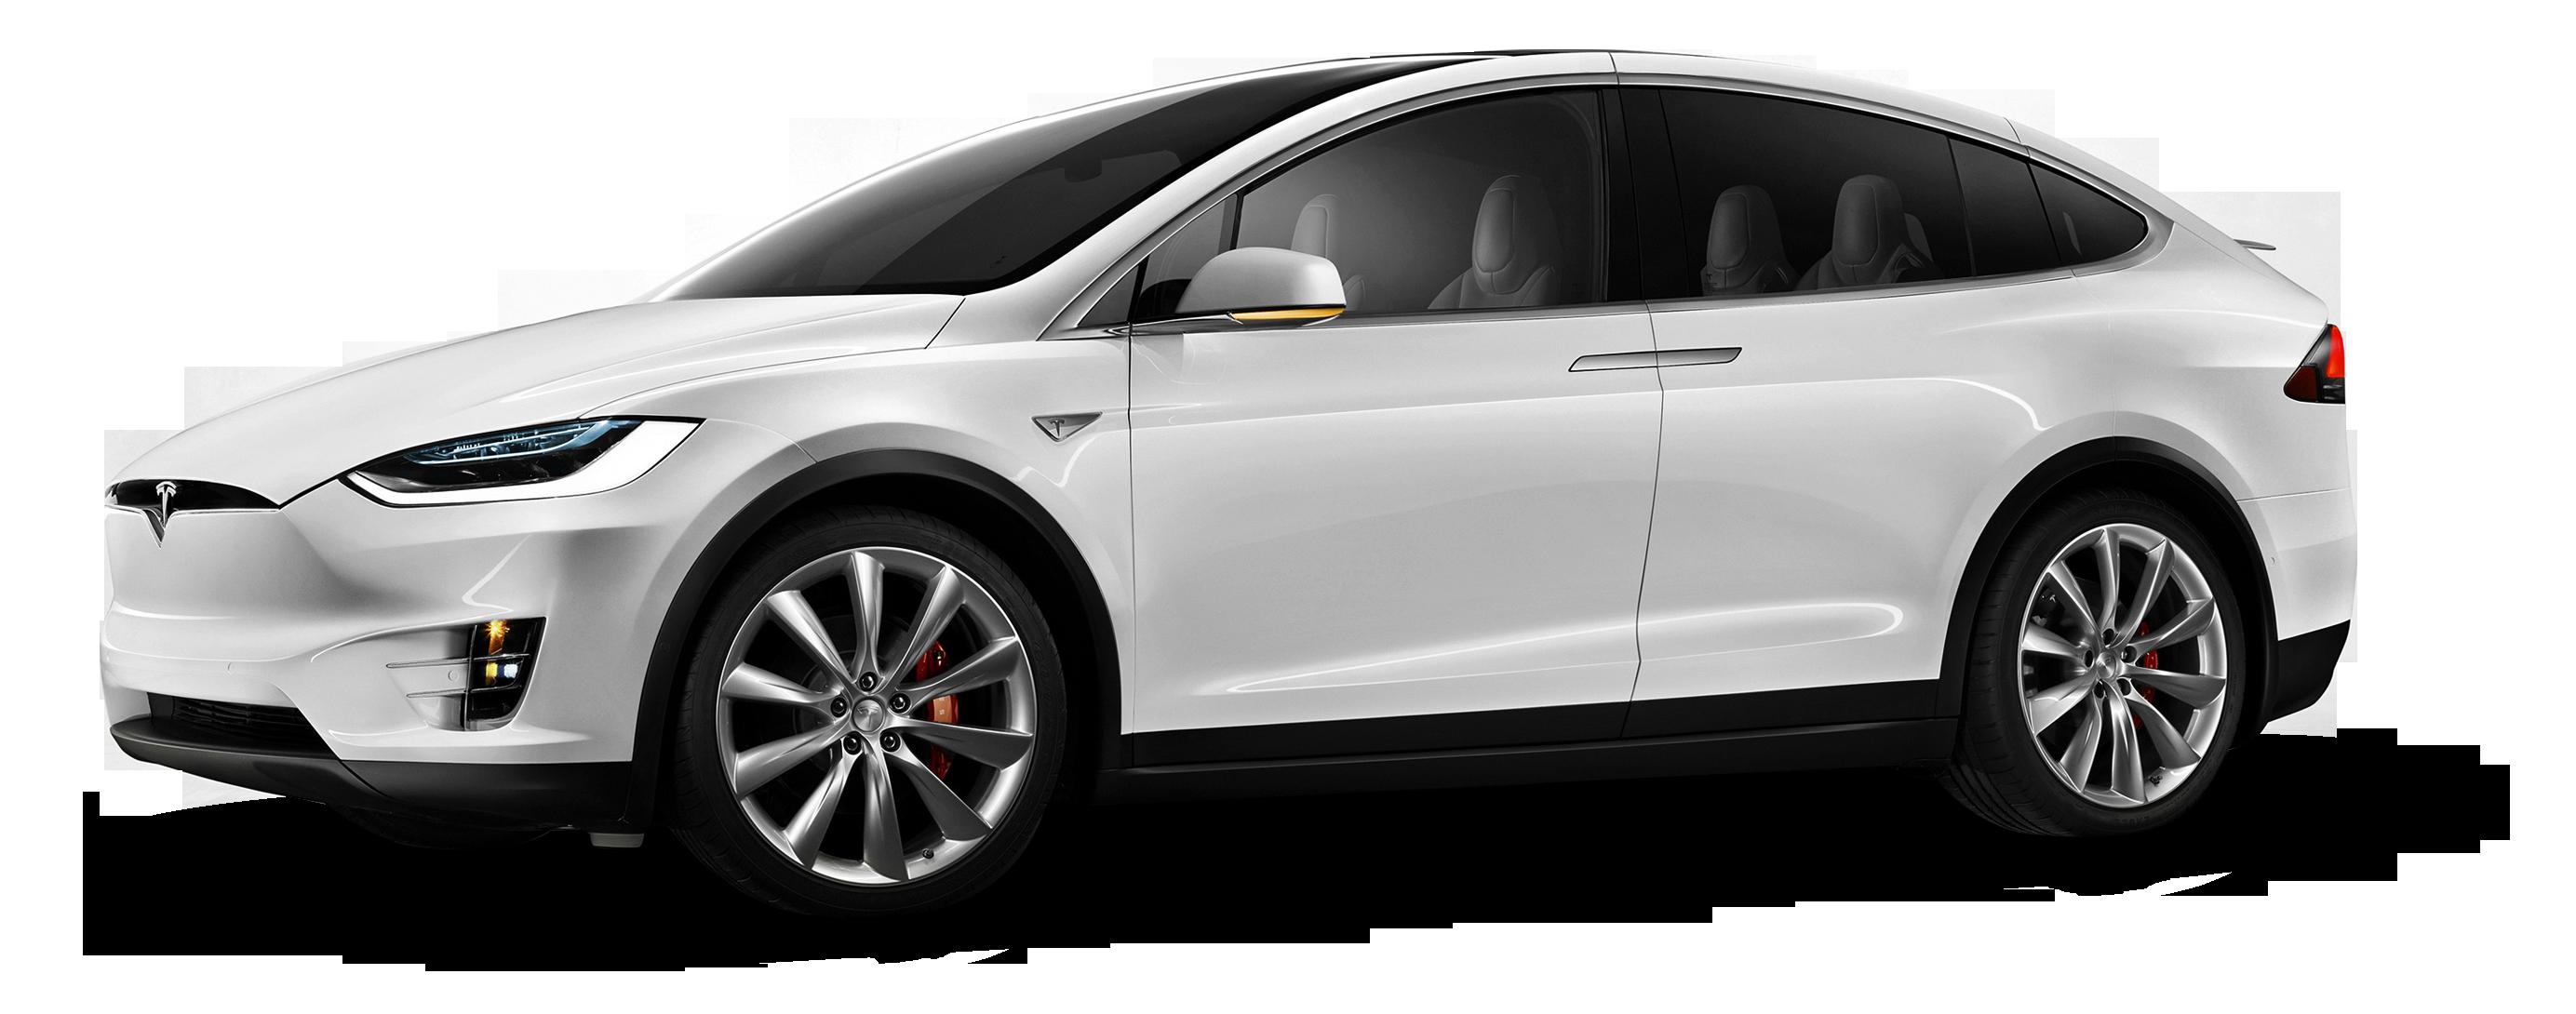 Tesla Model X White Car Png Image Tesla Model X Tesla Model White Car